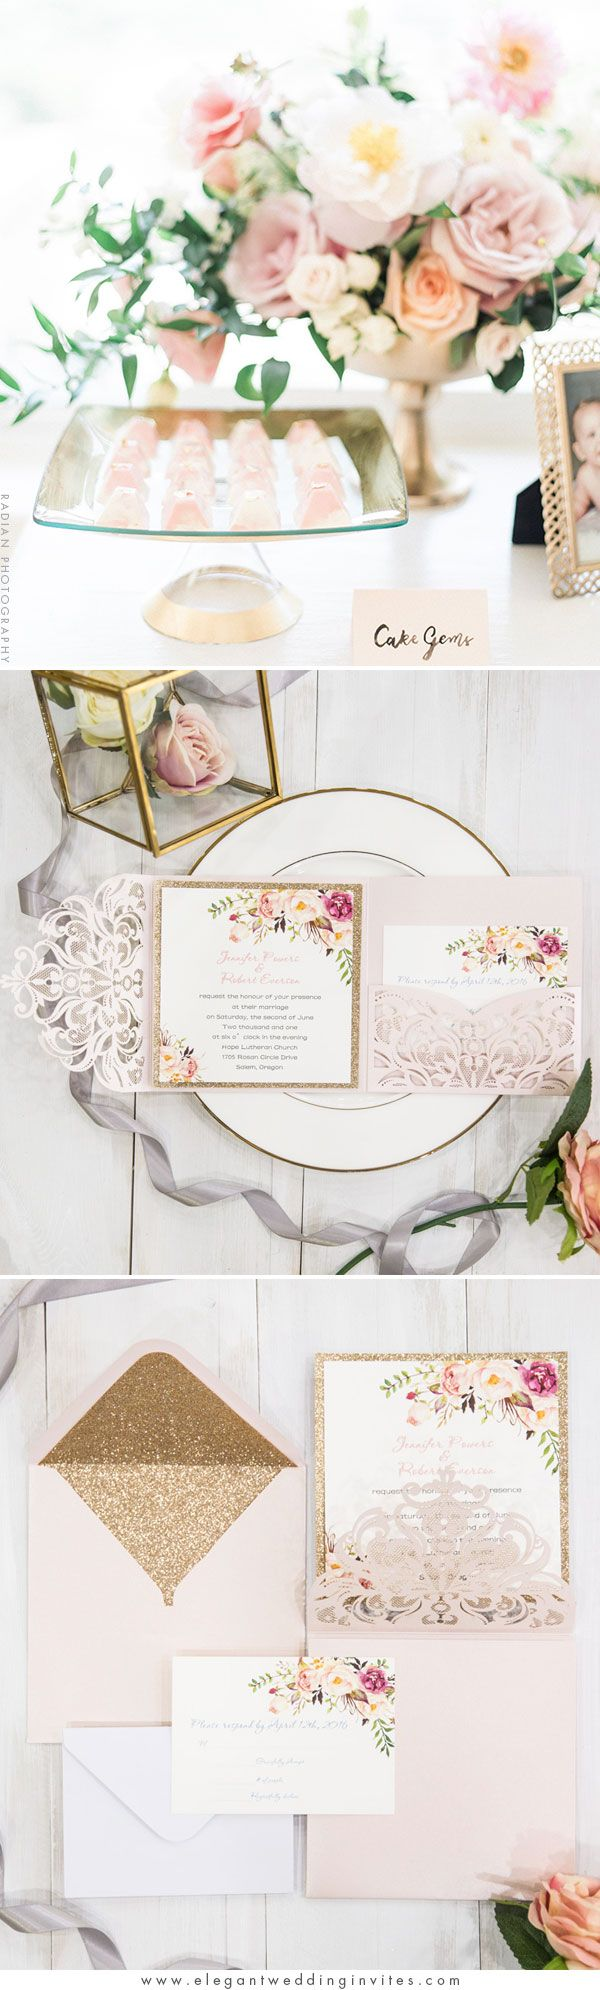 Romantic Blush Pink Floral Glitter Laser Cut Pocket Wedding Invitation EWWS201 #weddinginvitations #pinkwedding #goldwedding